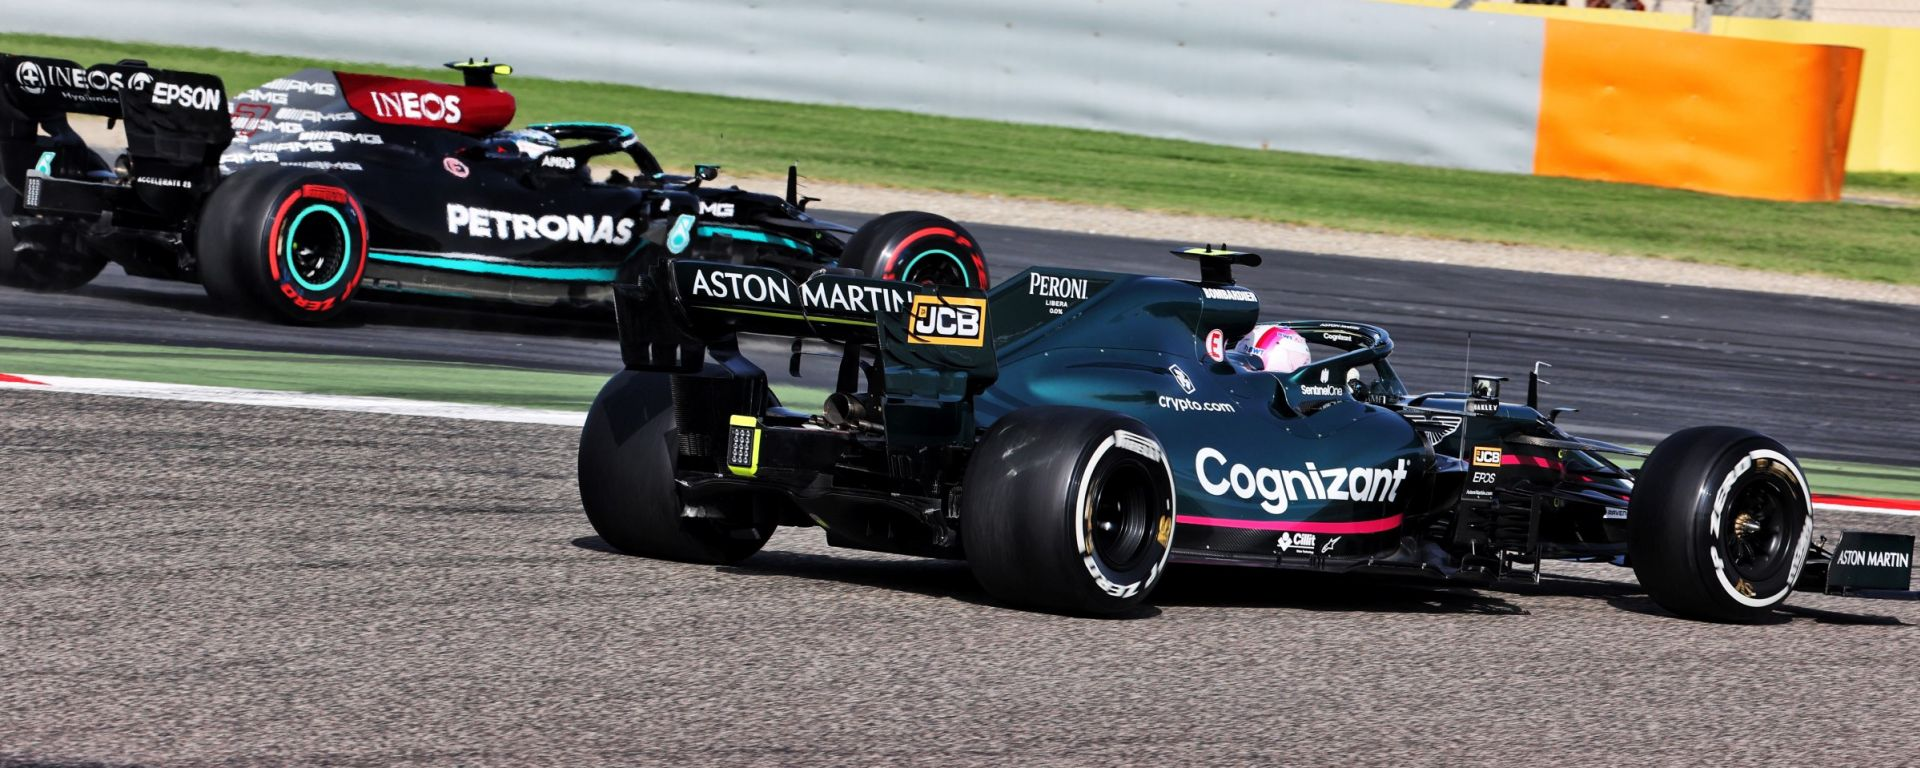 F1 2021: Sebastian Vettel (Aston Martin) e Valtteri Bottas (Mercedes)